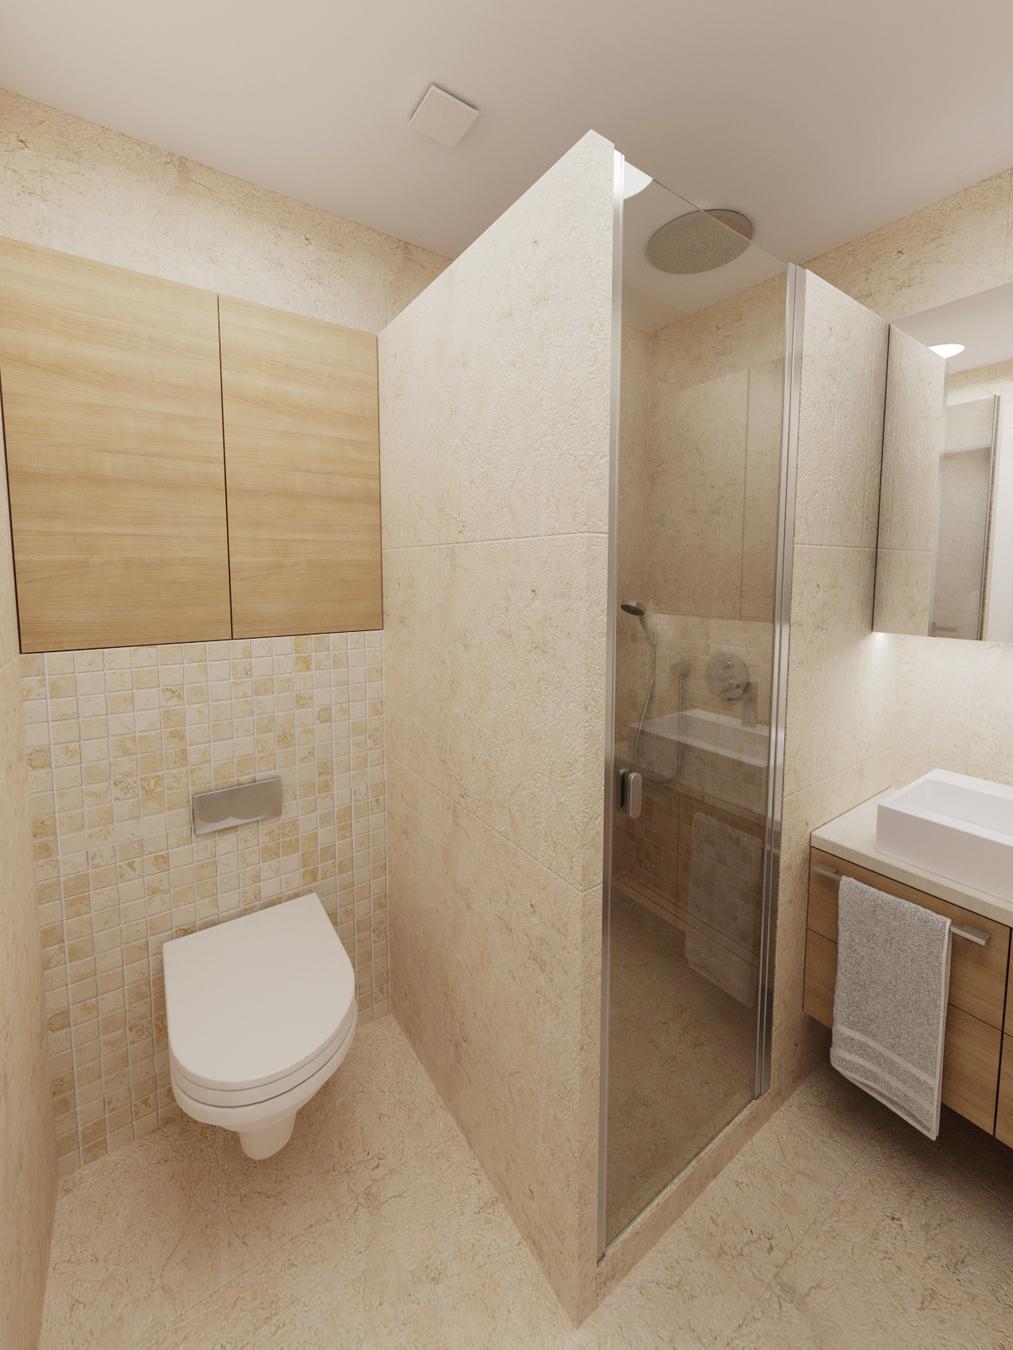 kolar_lubor_WC koupelna 010000